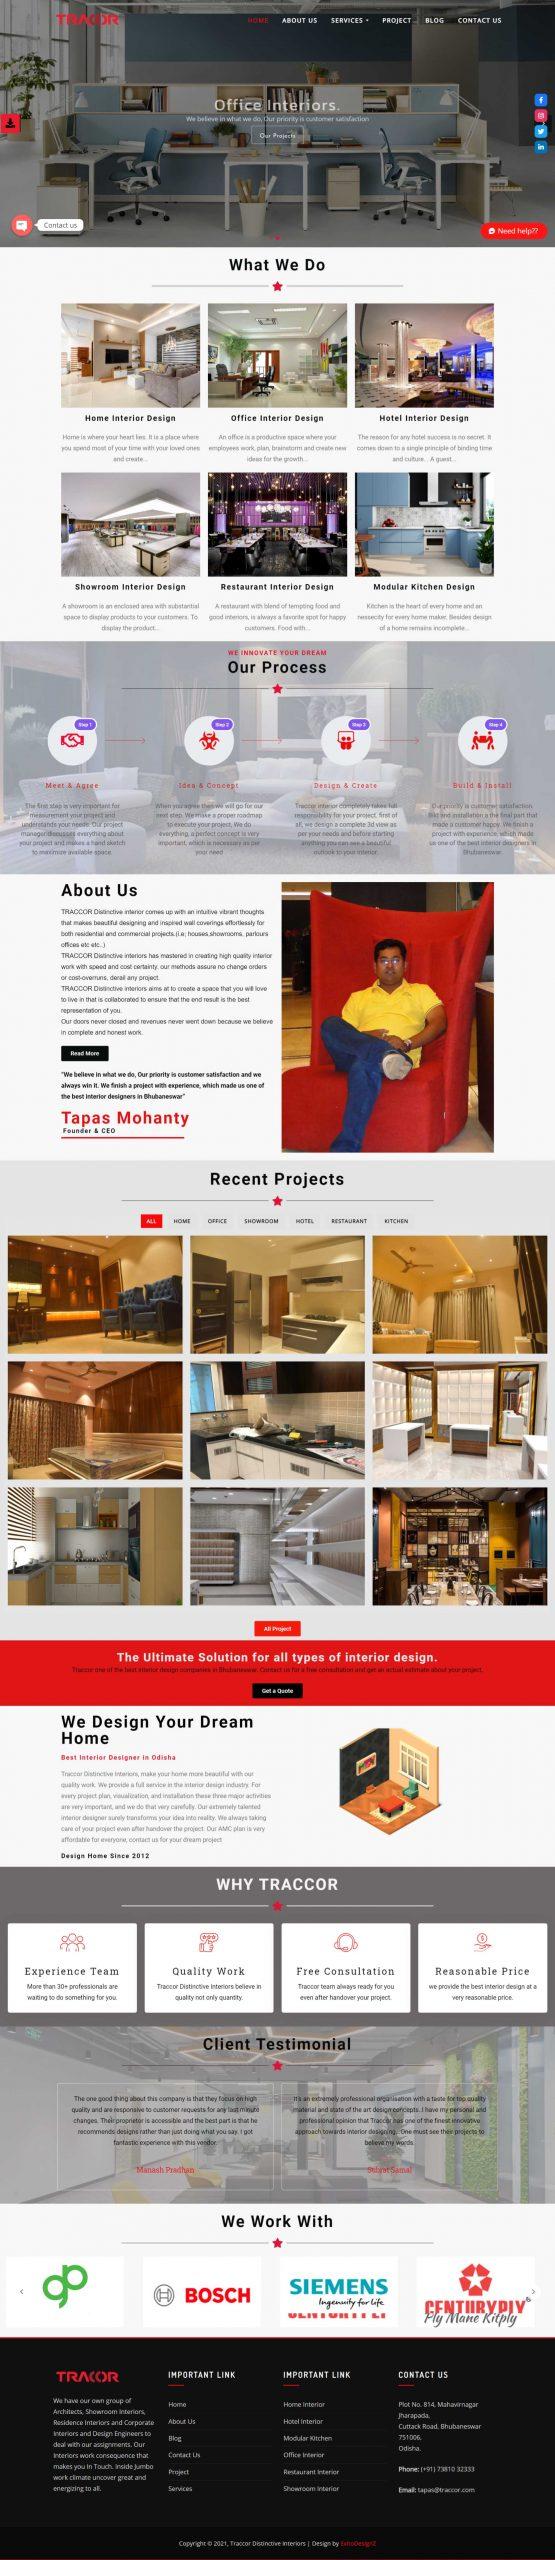 traccor website